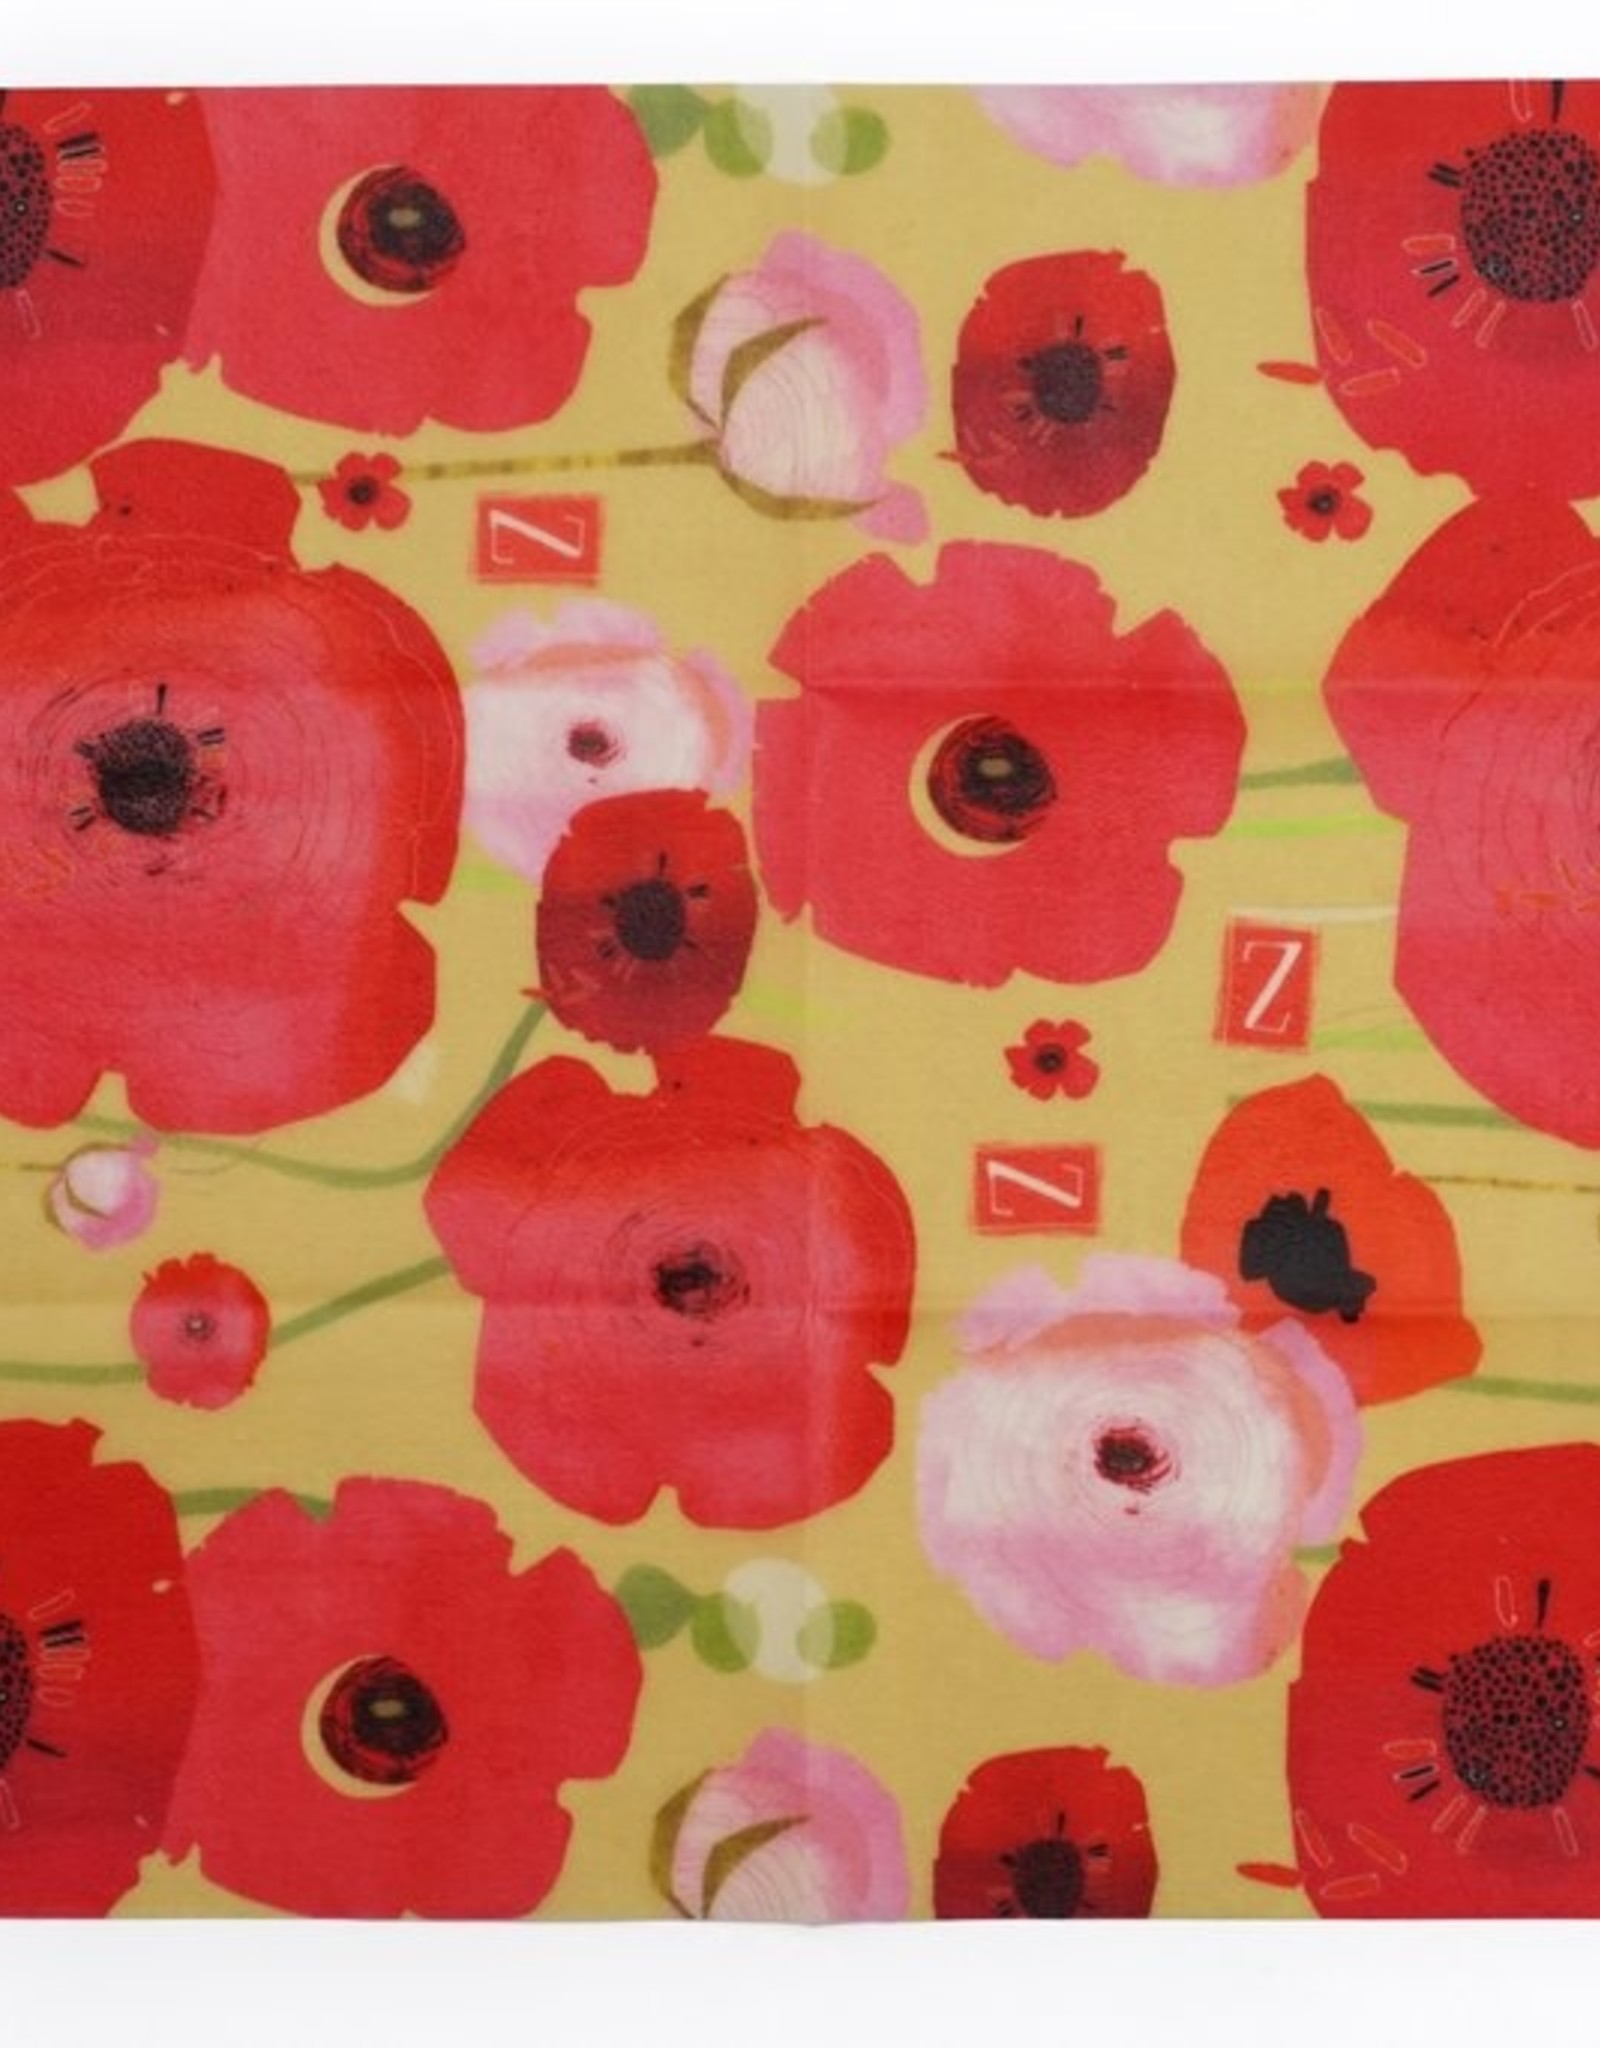 Zwrap Asst Painted Poppies